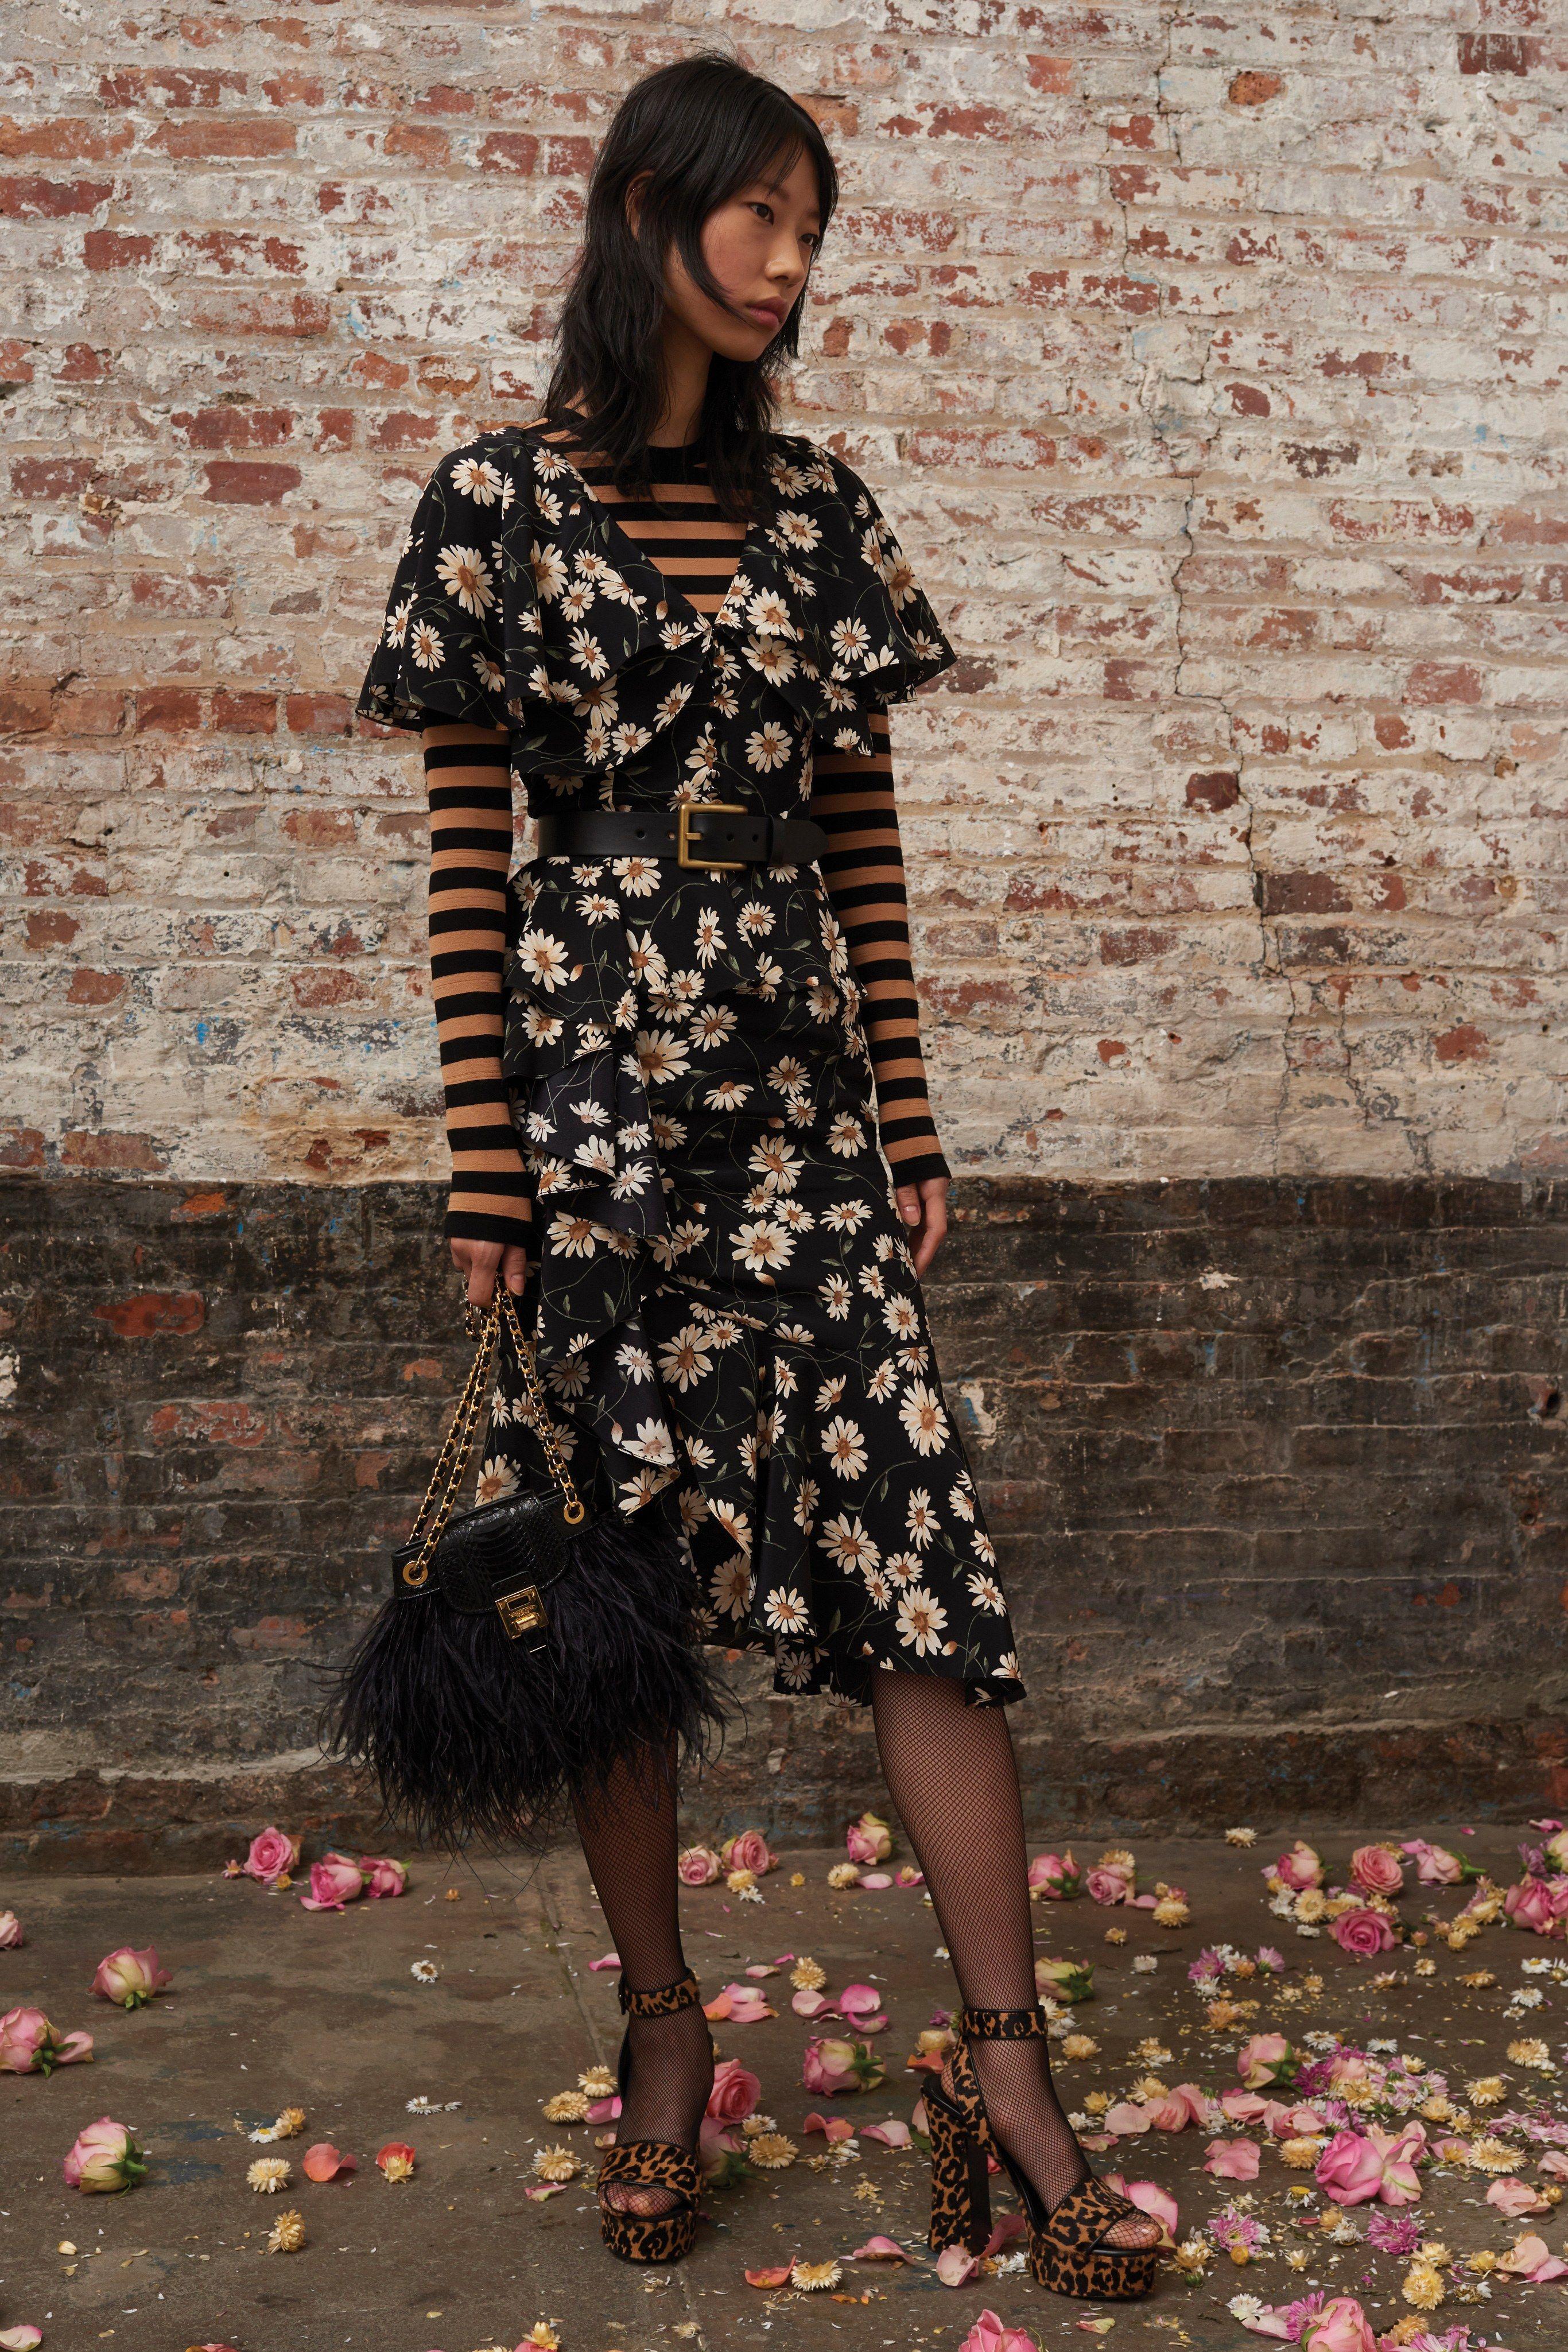 3b5e6d9a785d7 Michael Kors Collection Pre-Fall 2019 Fashion Show in 2019 | Pre ...